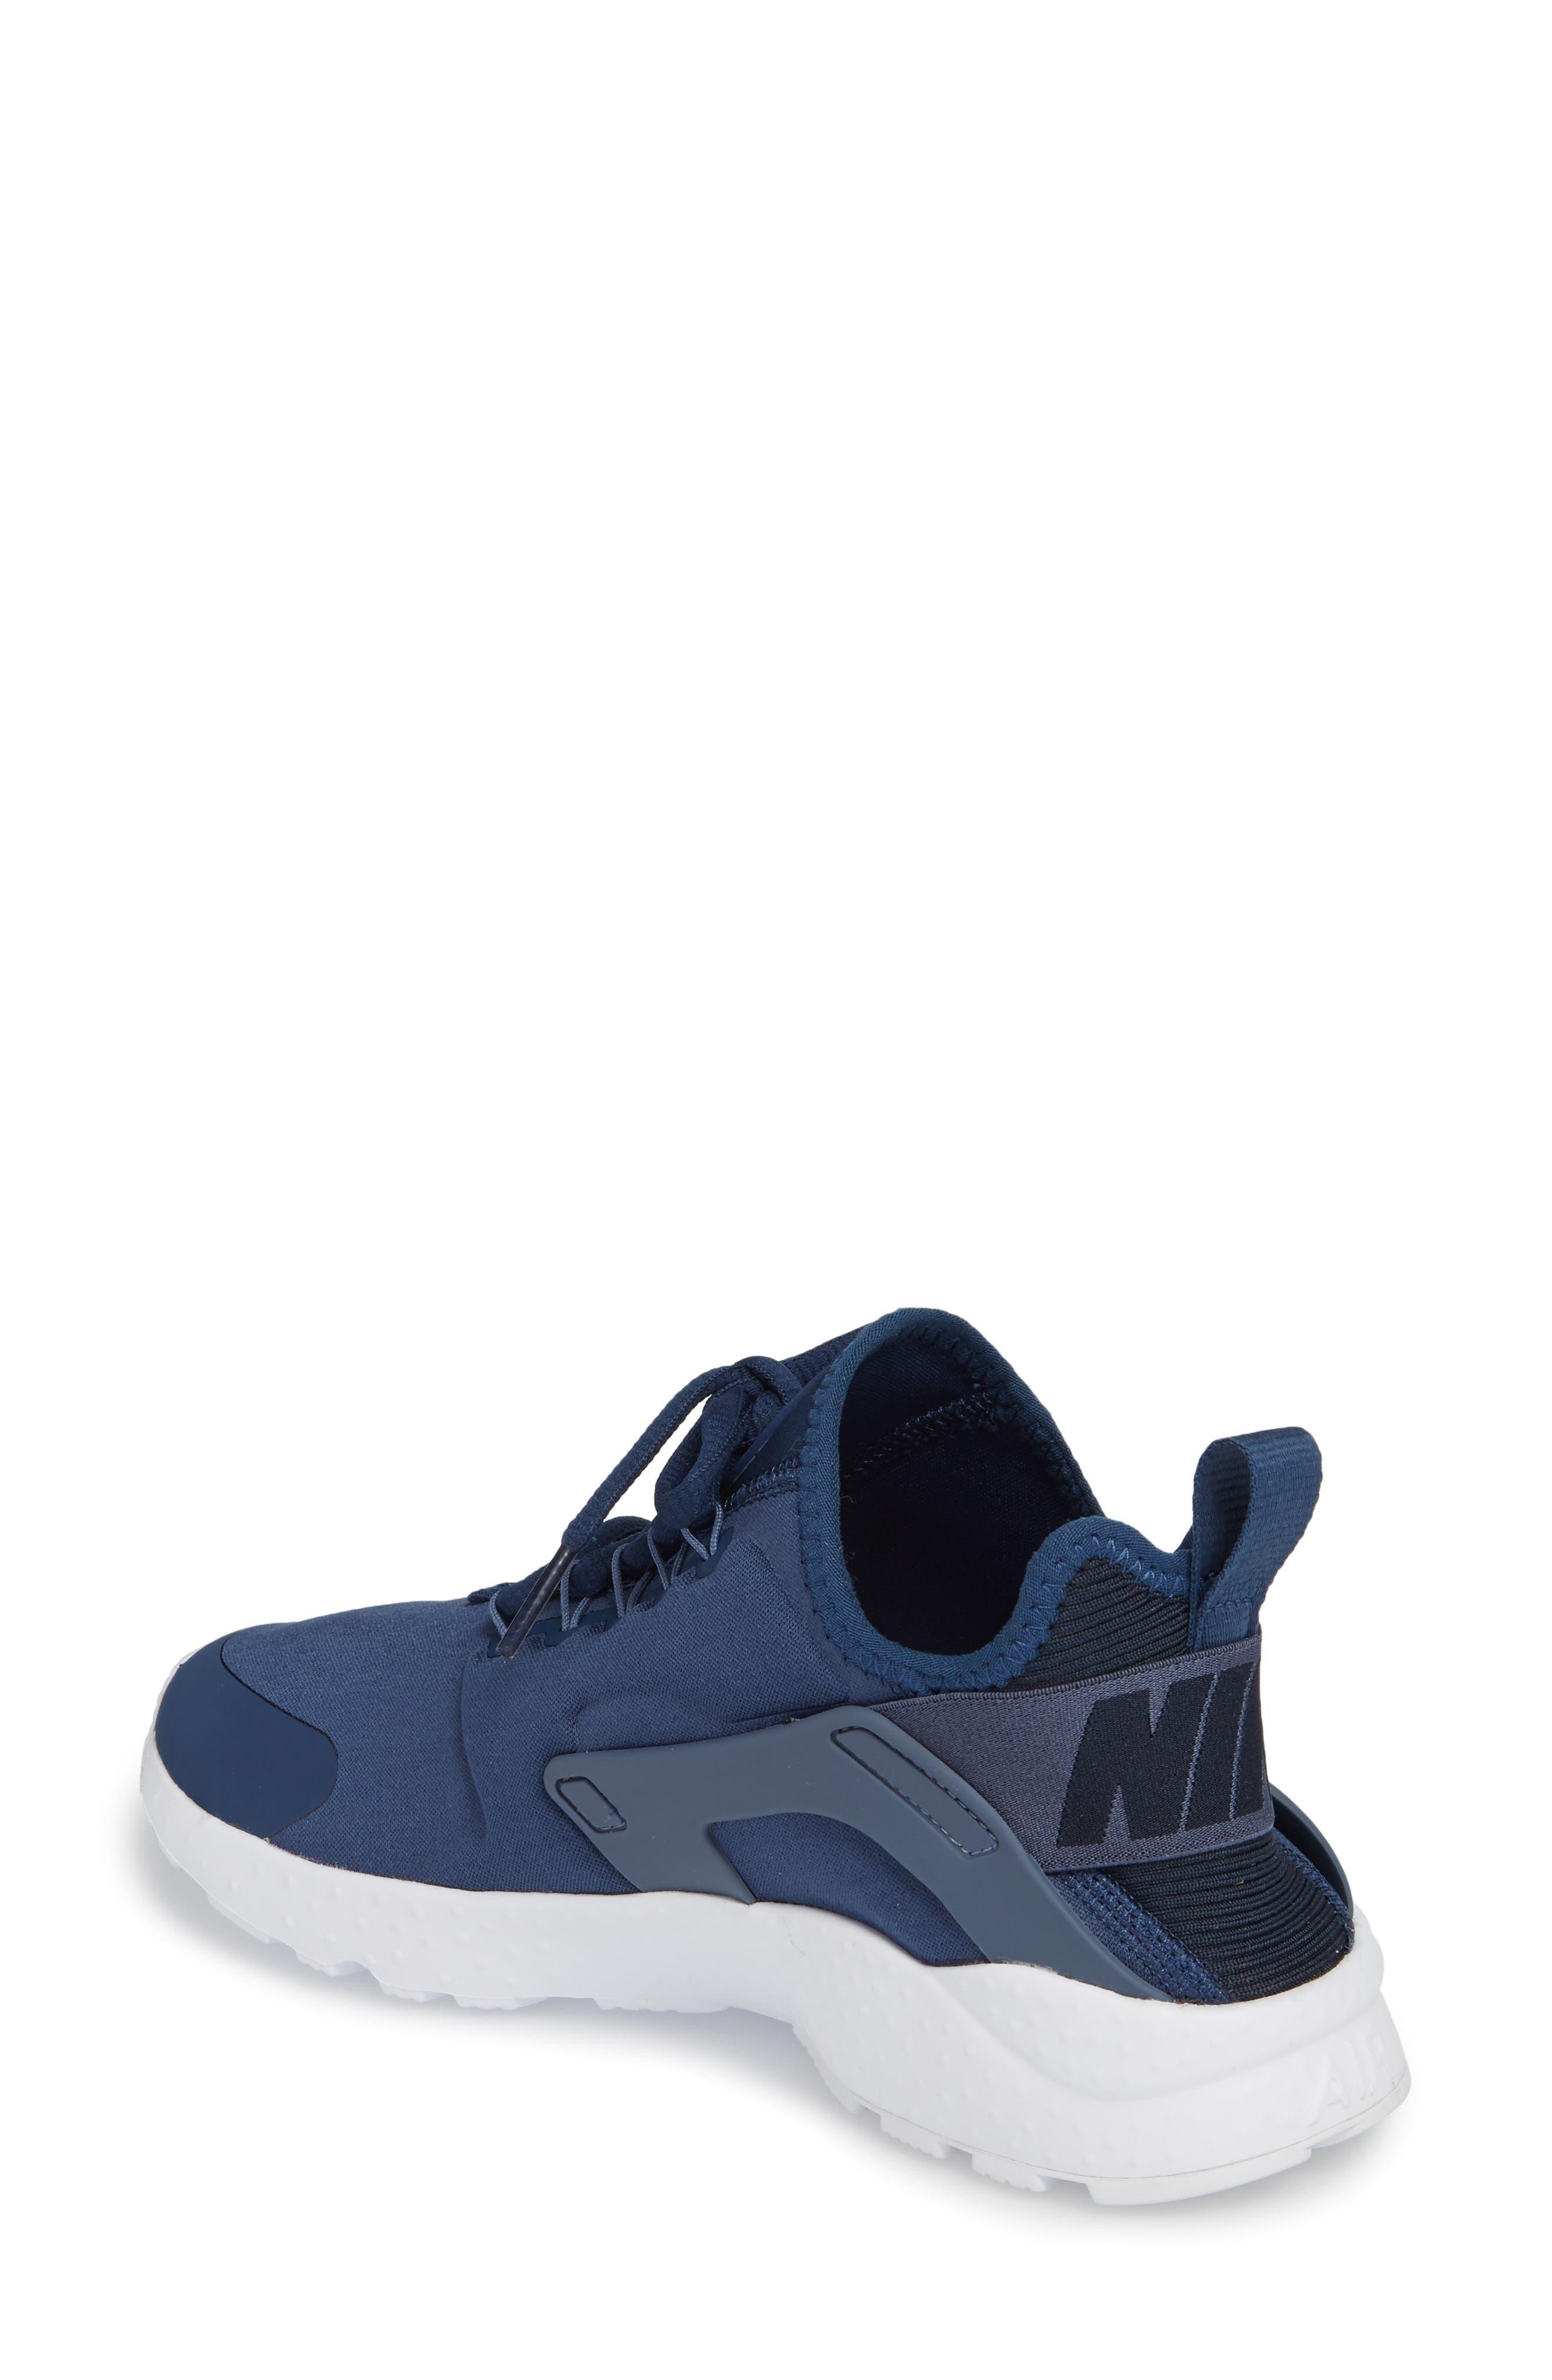 Air Huarache Sneaker,                             Alternate thumbnail 43, color,